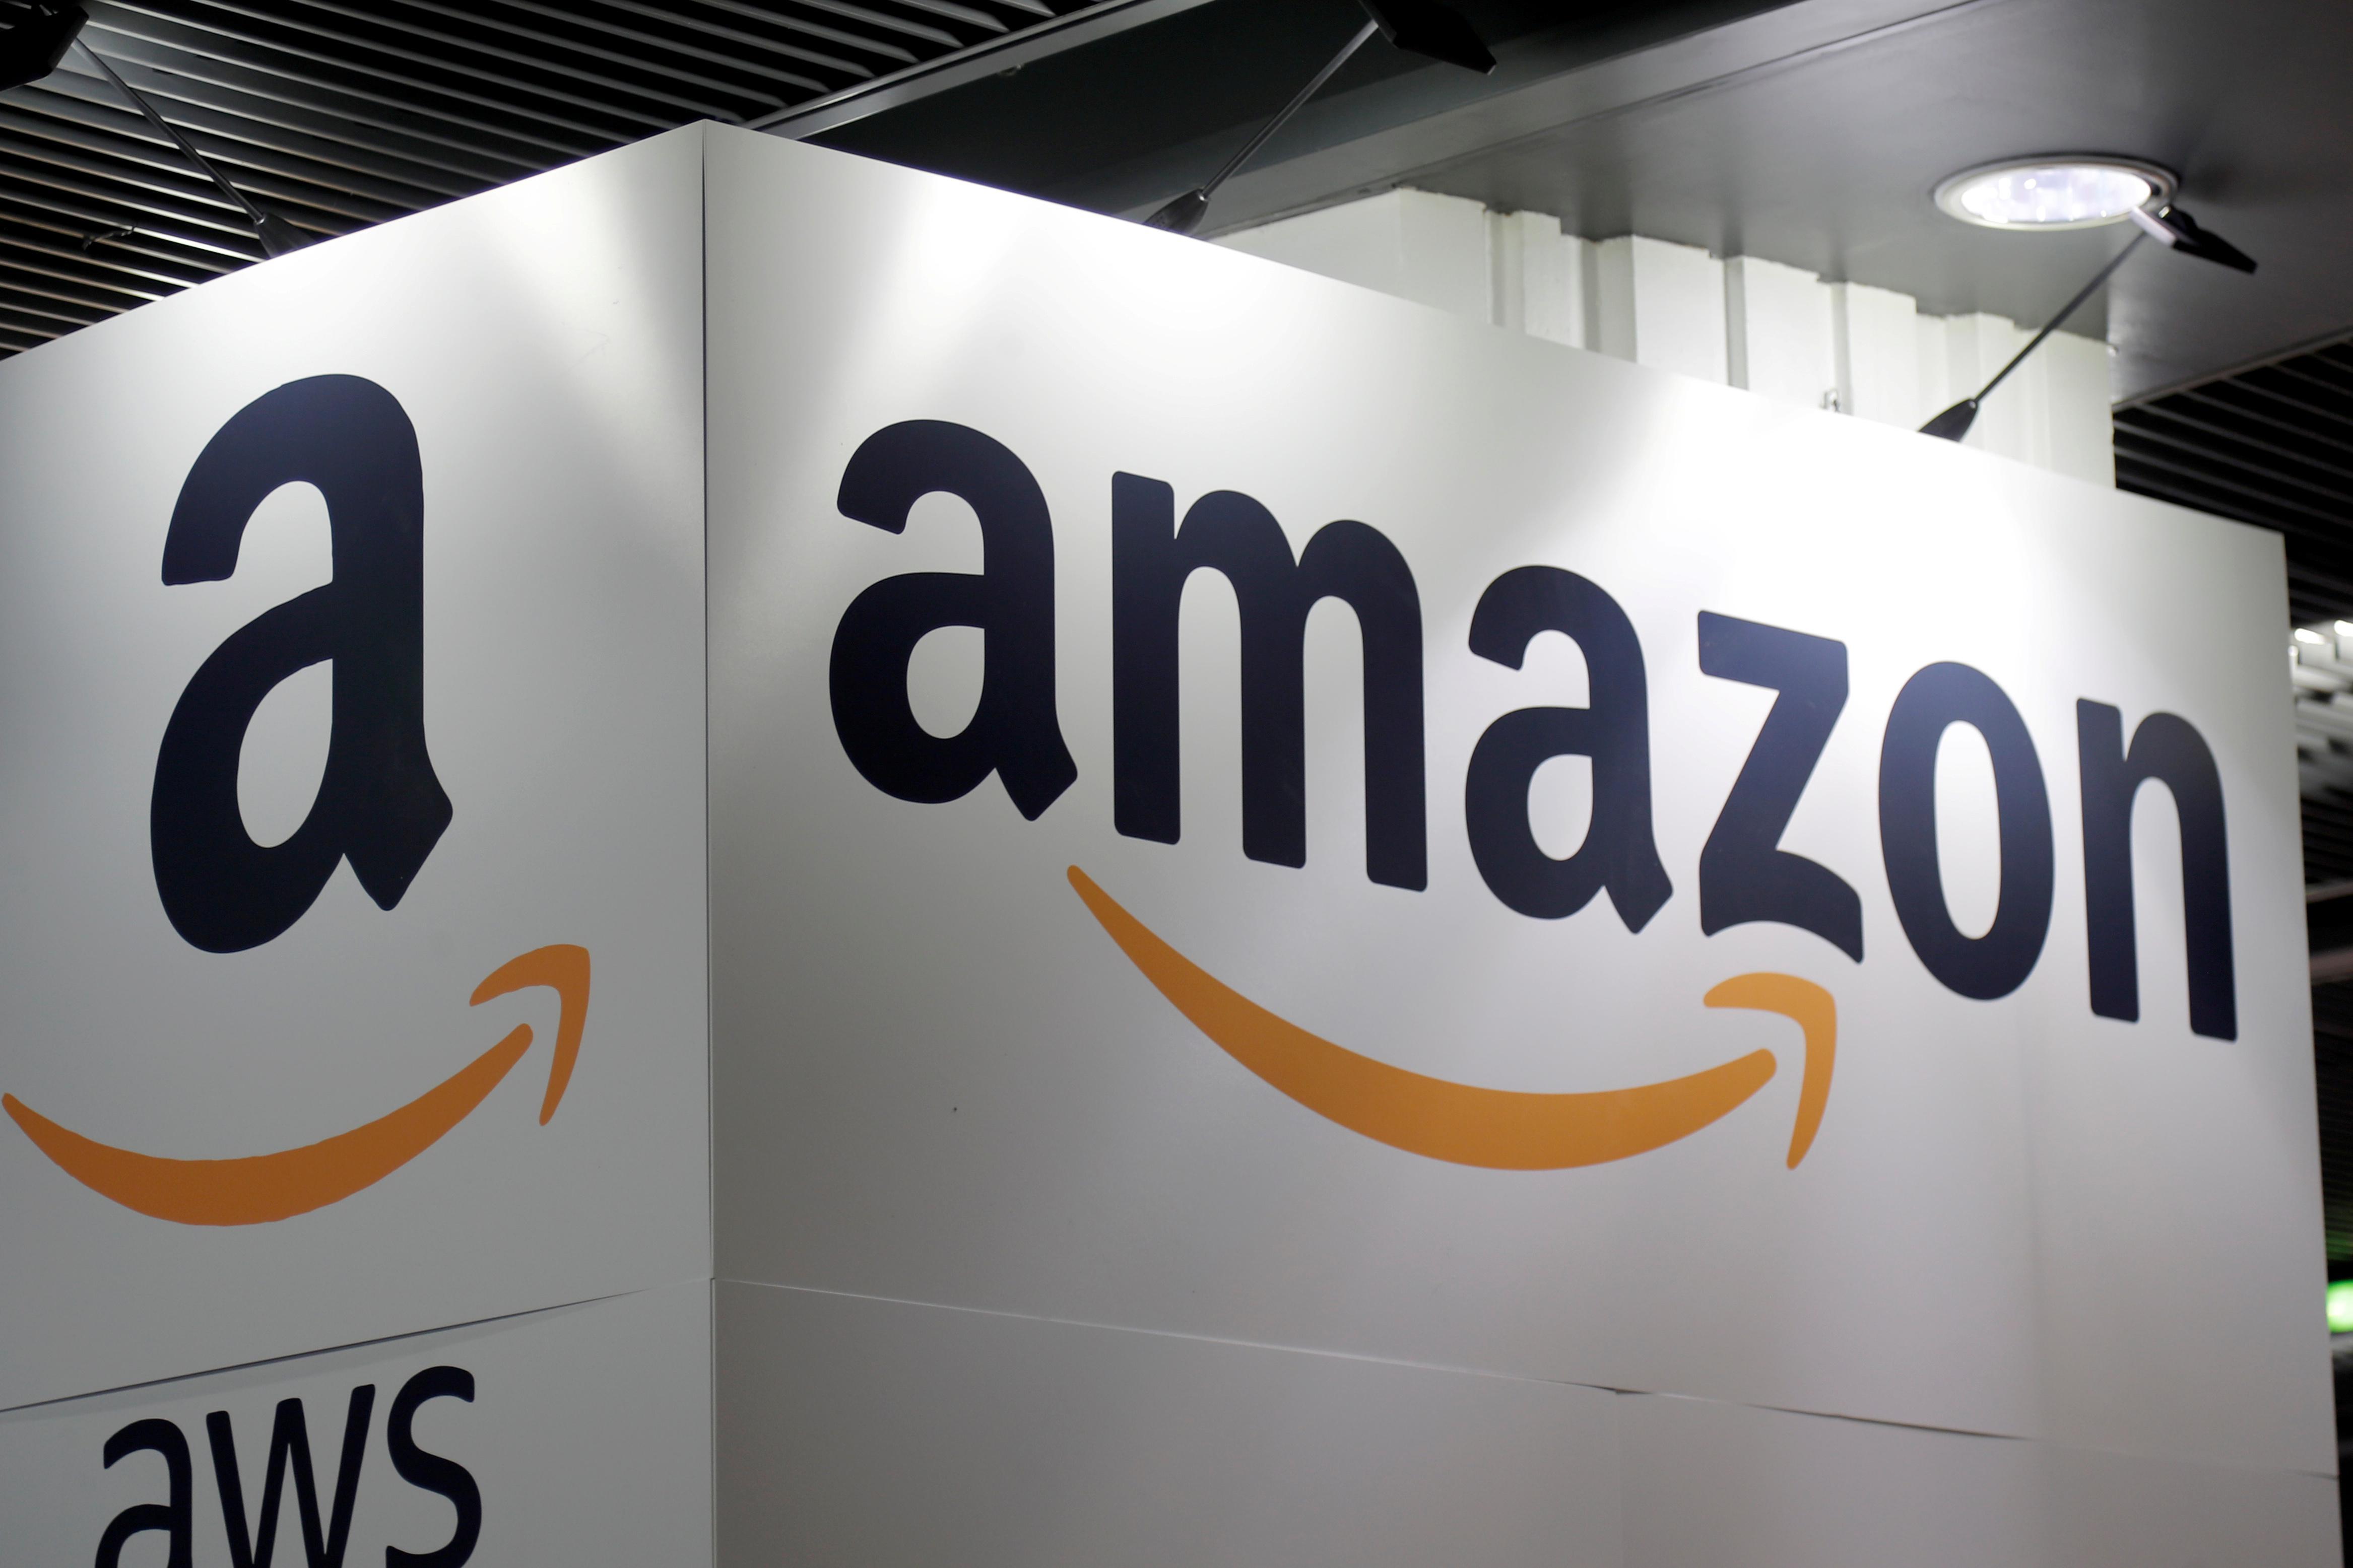 Amazon's Ring camera raises civil liberties concerns: U.S. senator